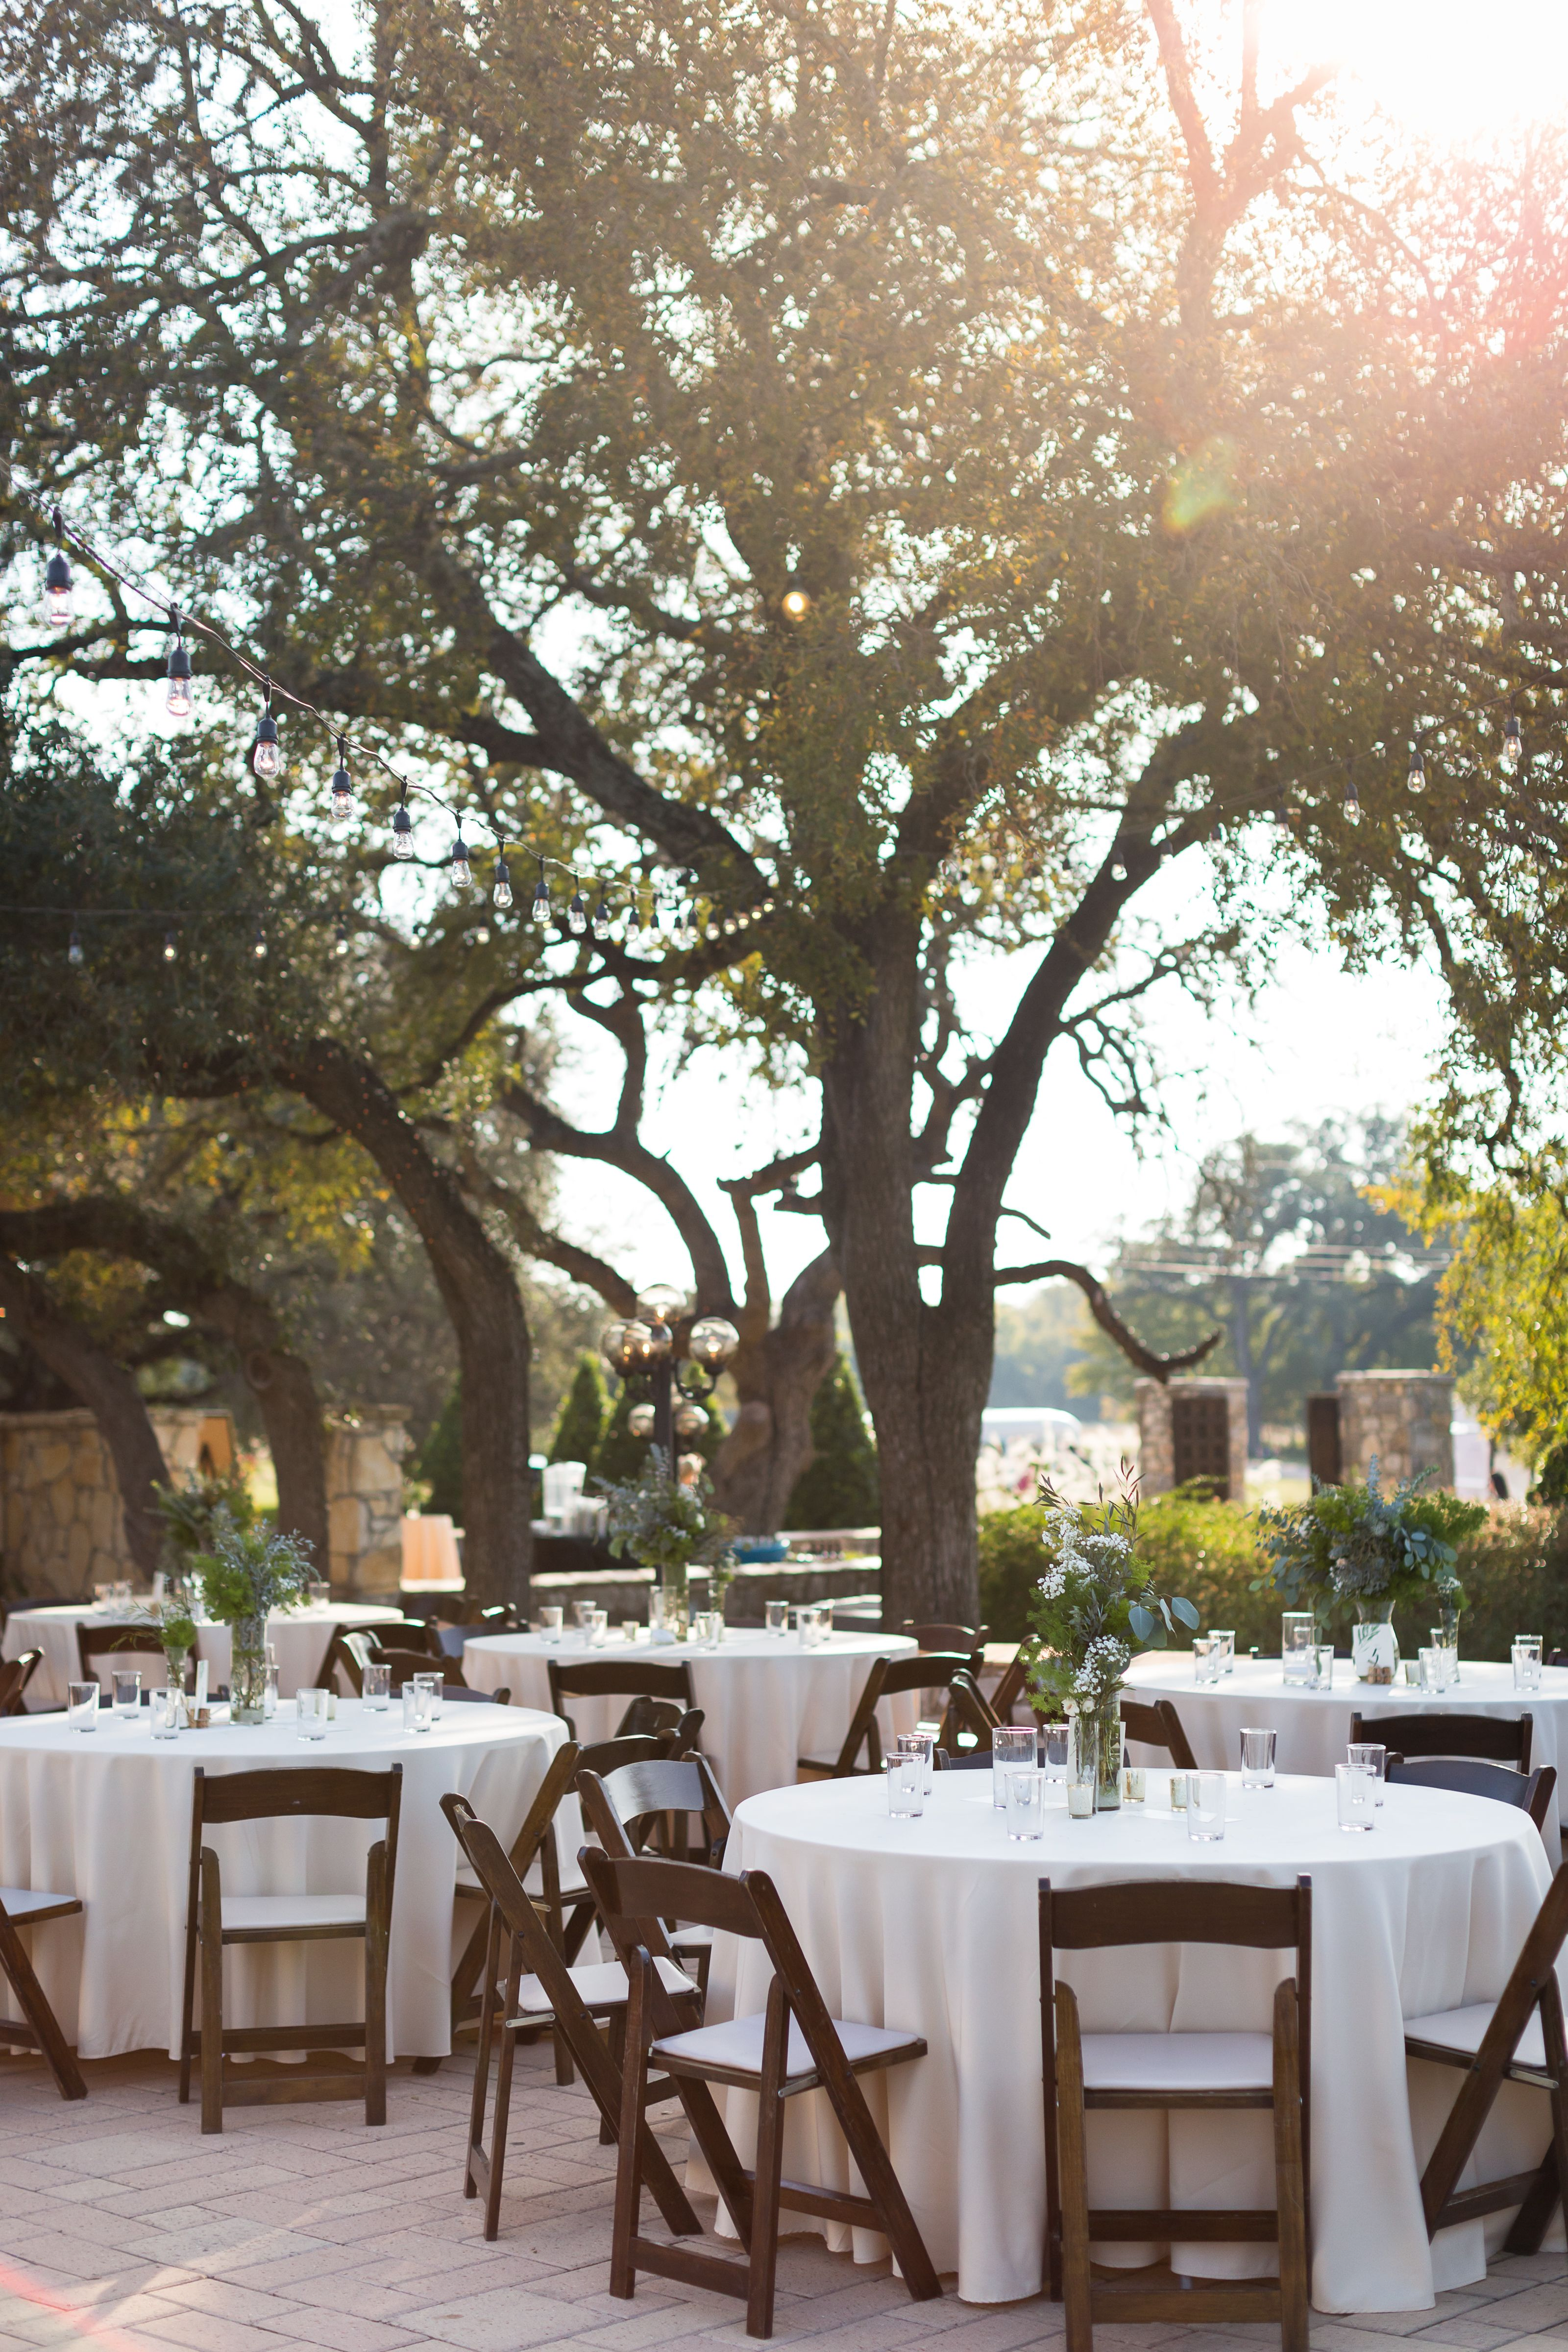 Wedding Reception Decor At The Vineyards At Chappel Lodge